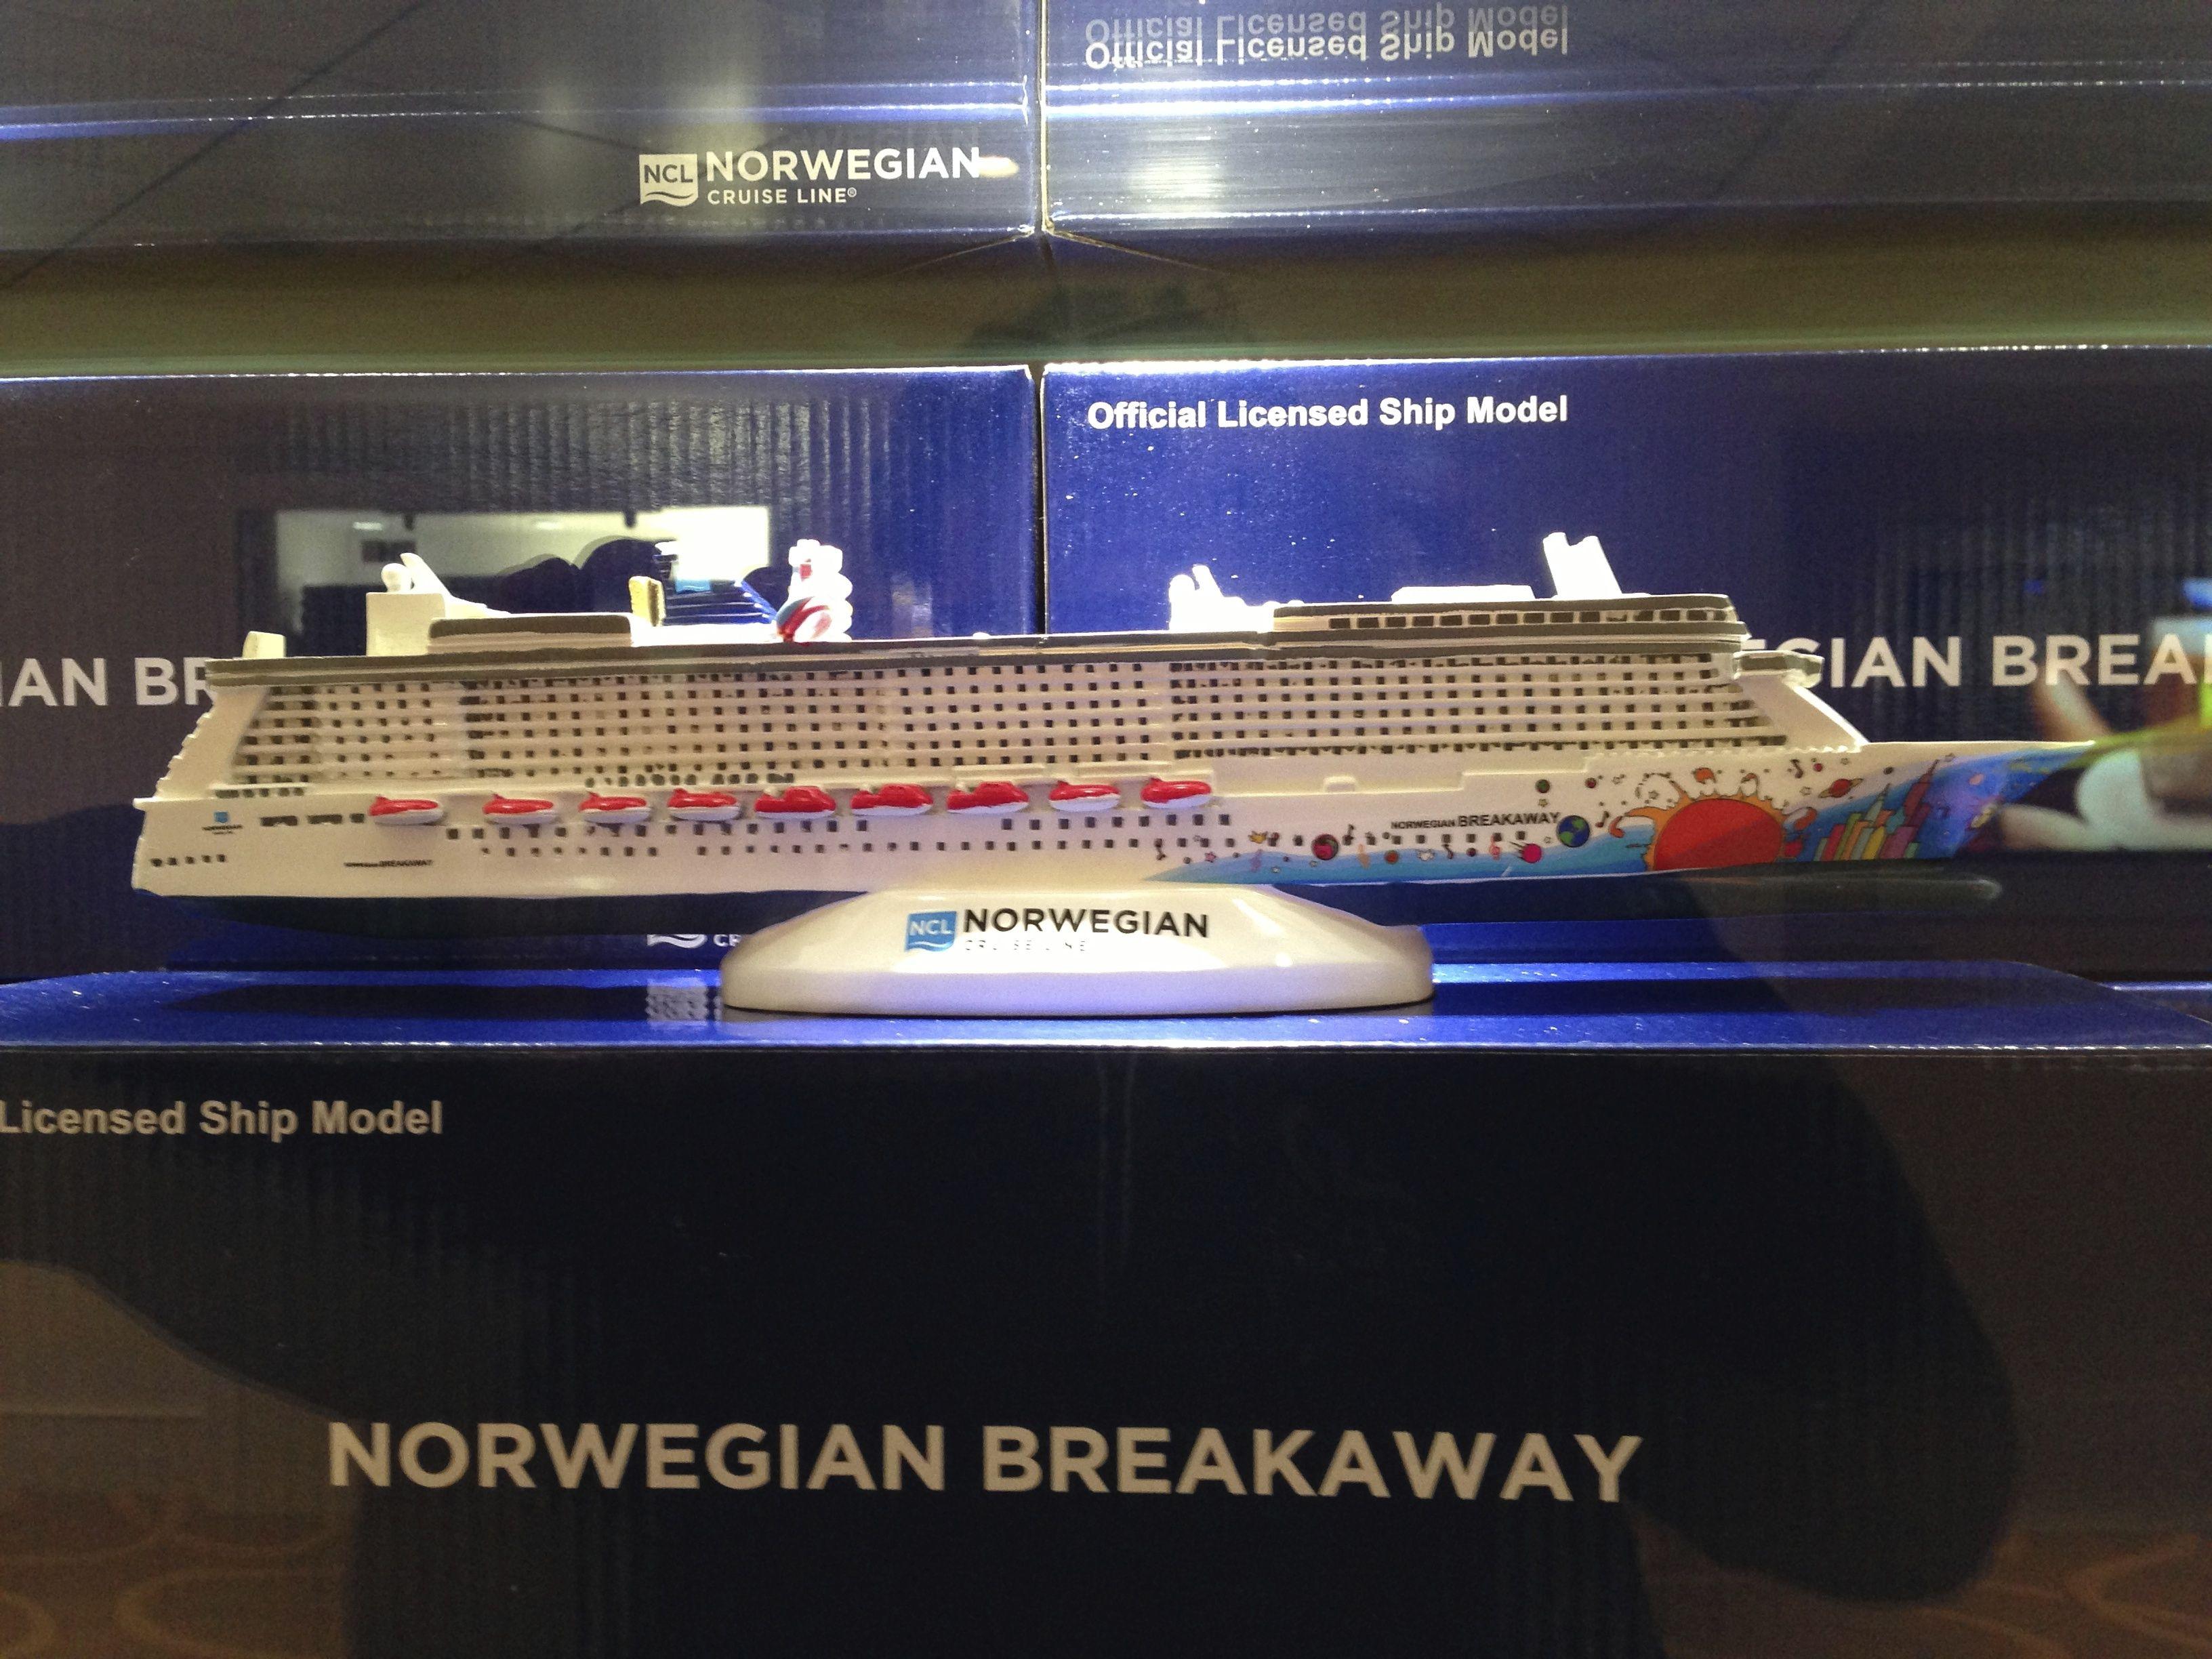 NCL Breakaway Model Ship Httpwwwpsdiceartcouk Titanic - Cruise ships uk